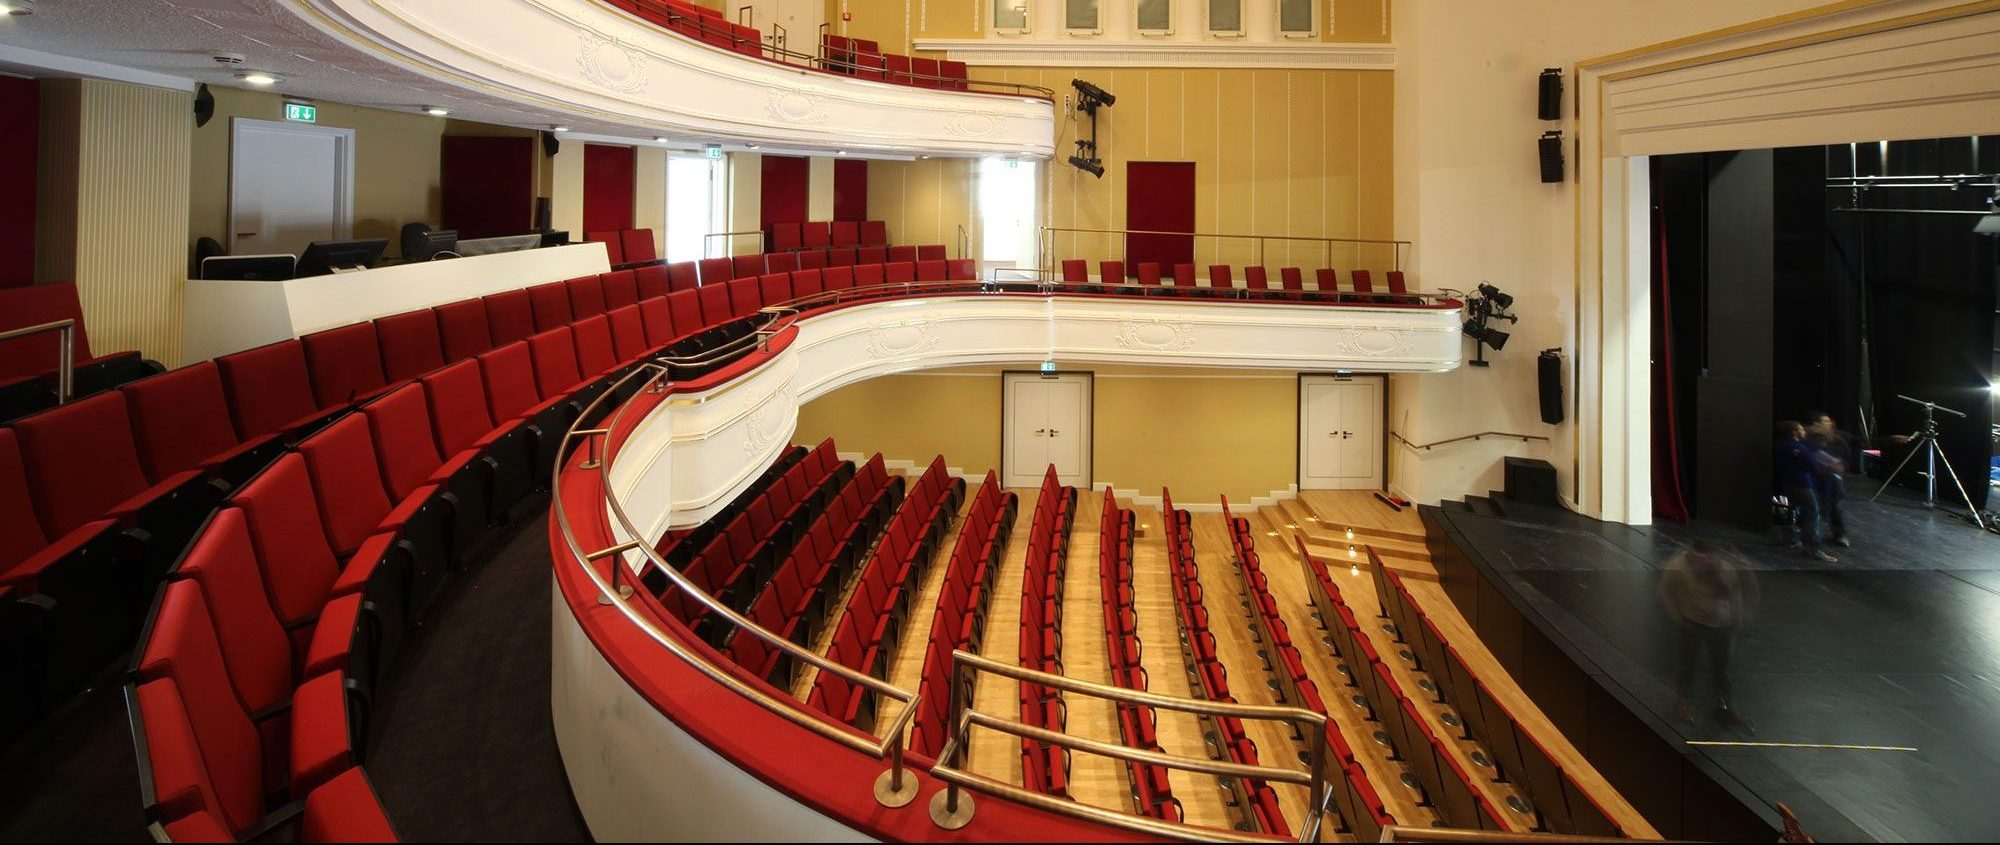 Kulturbund der Lessingstadt Wolfenbüttel e.V. - Lessingtheater Saal